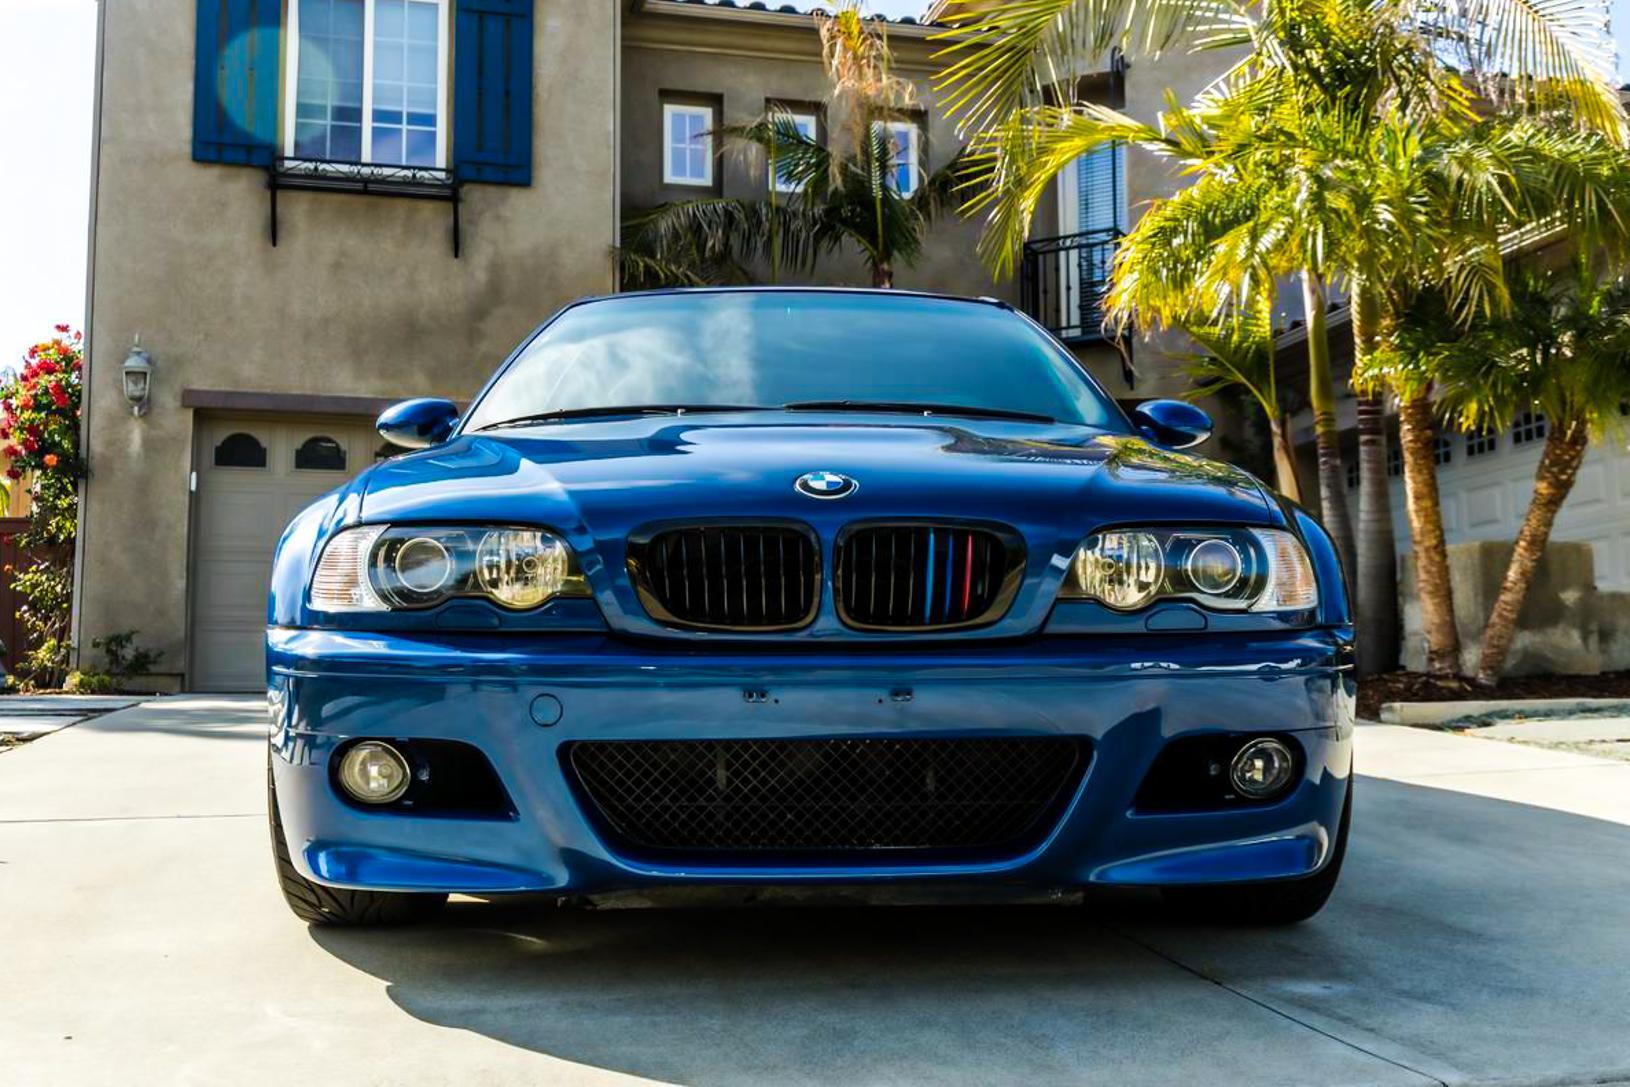 2002 BMW M3 'Slicktop'